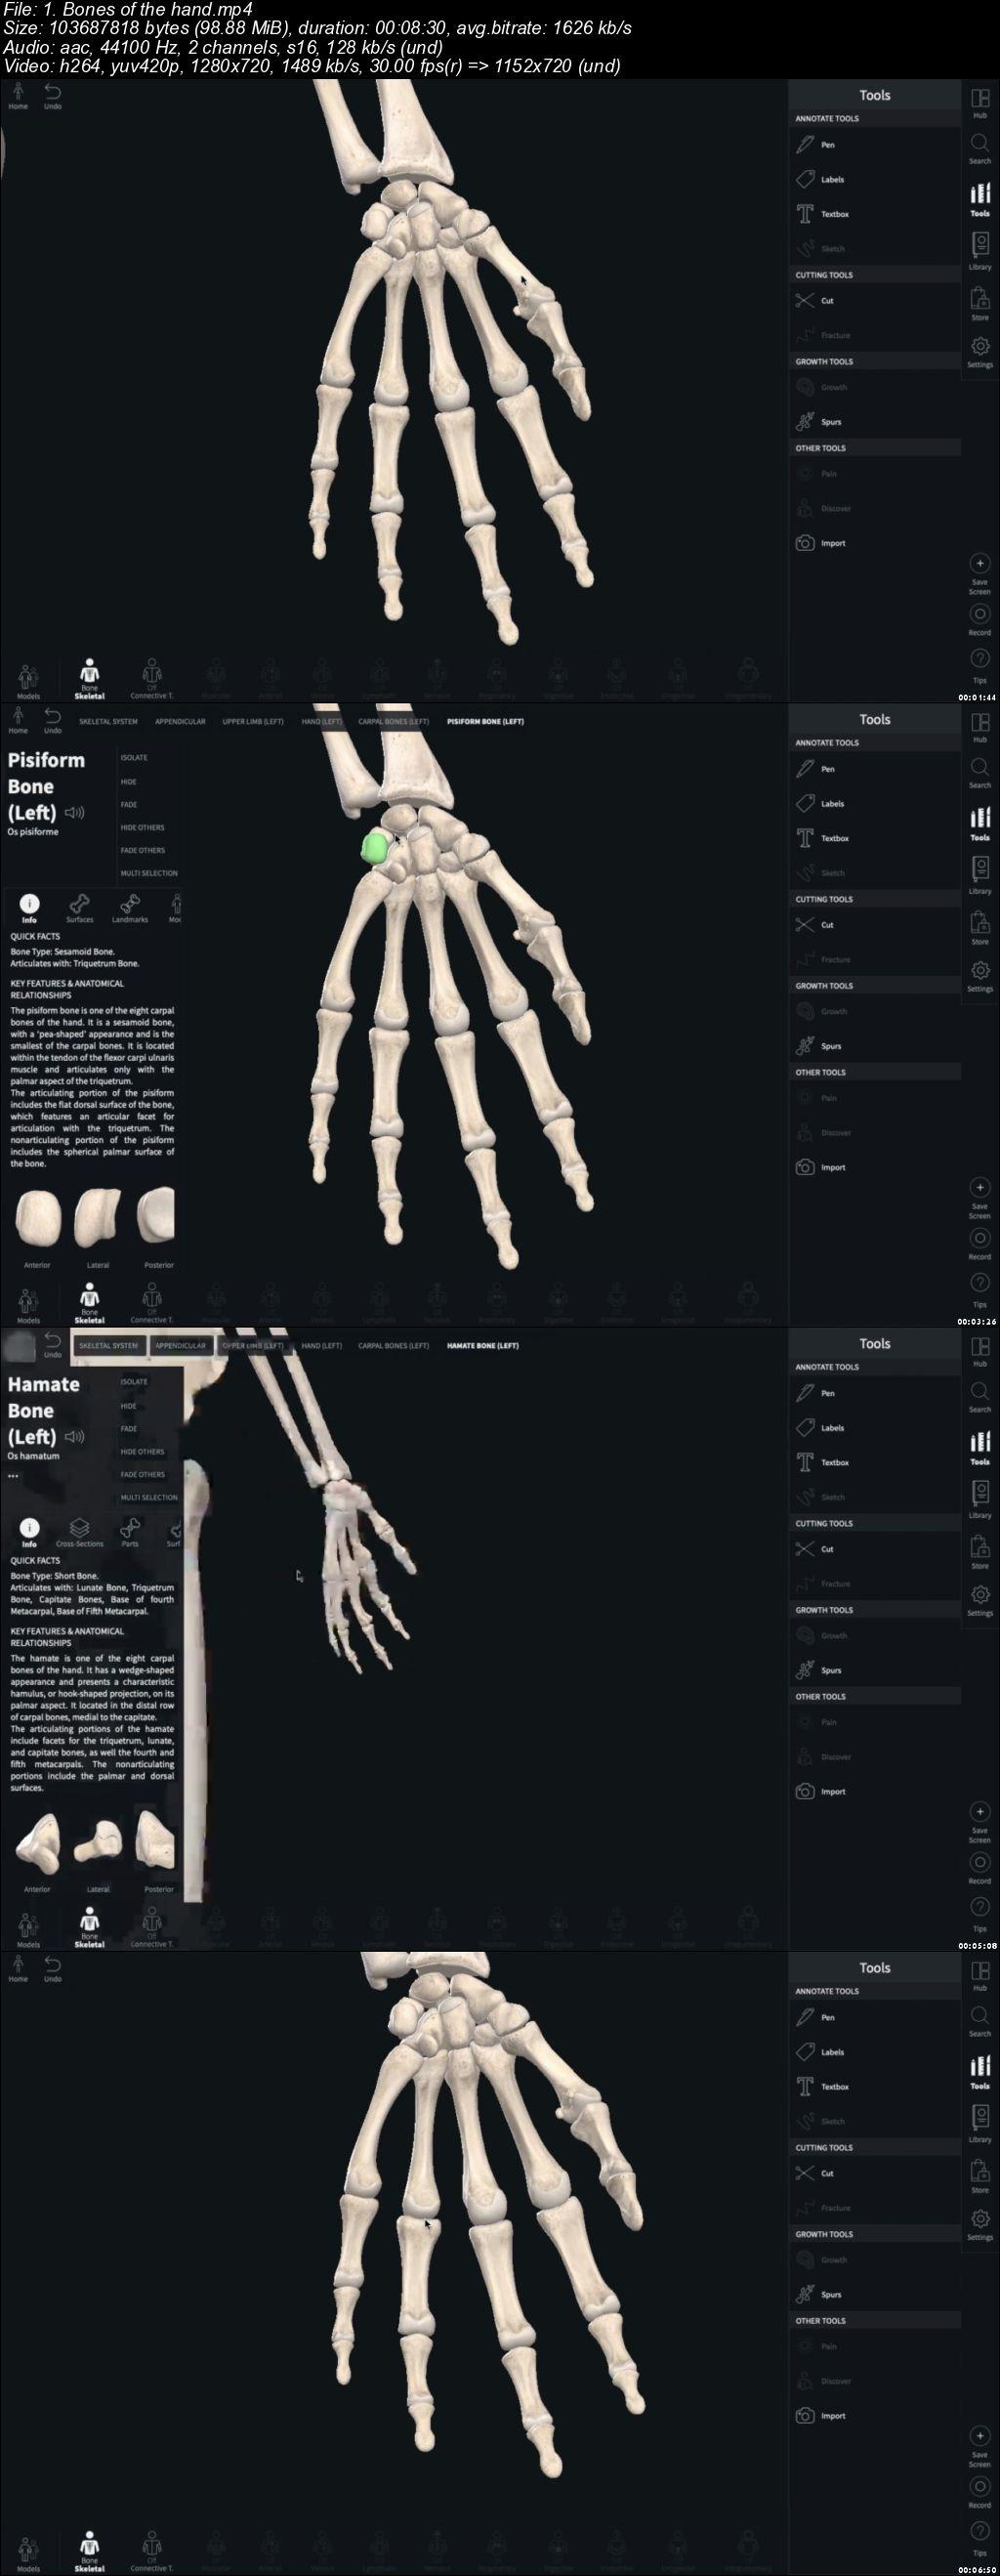 Human Skeletal System Part 1 The Upper Limb Avaxhome